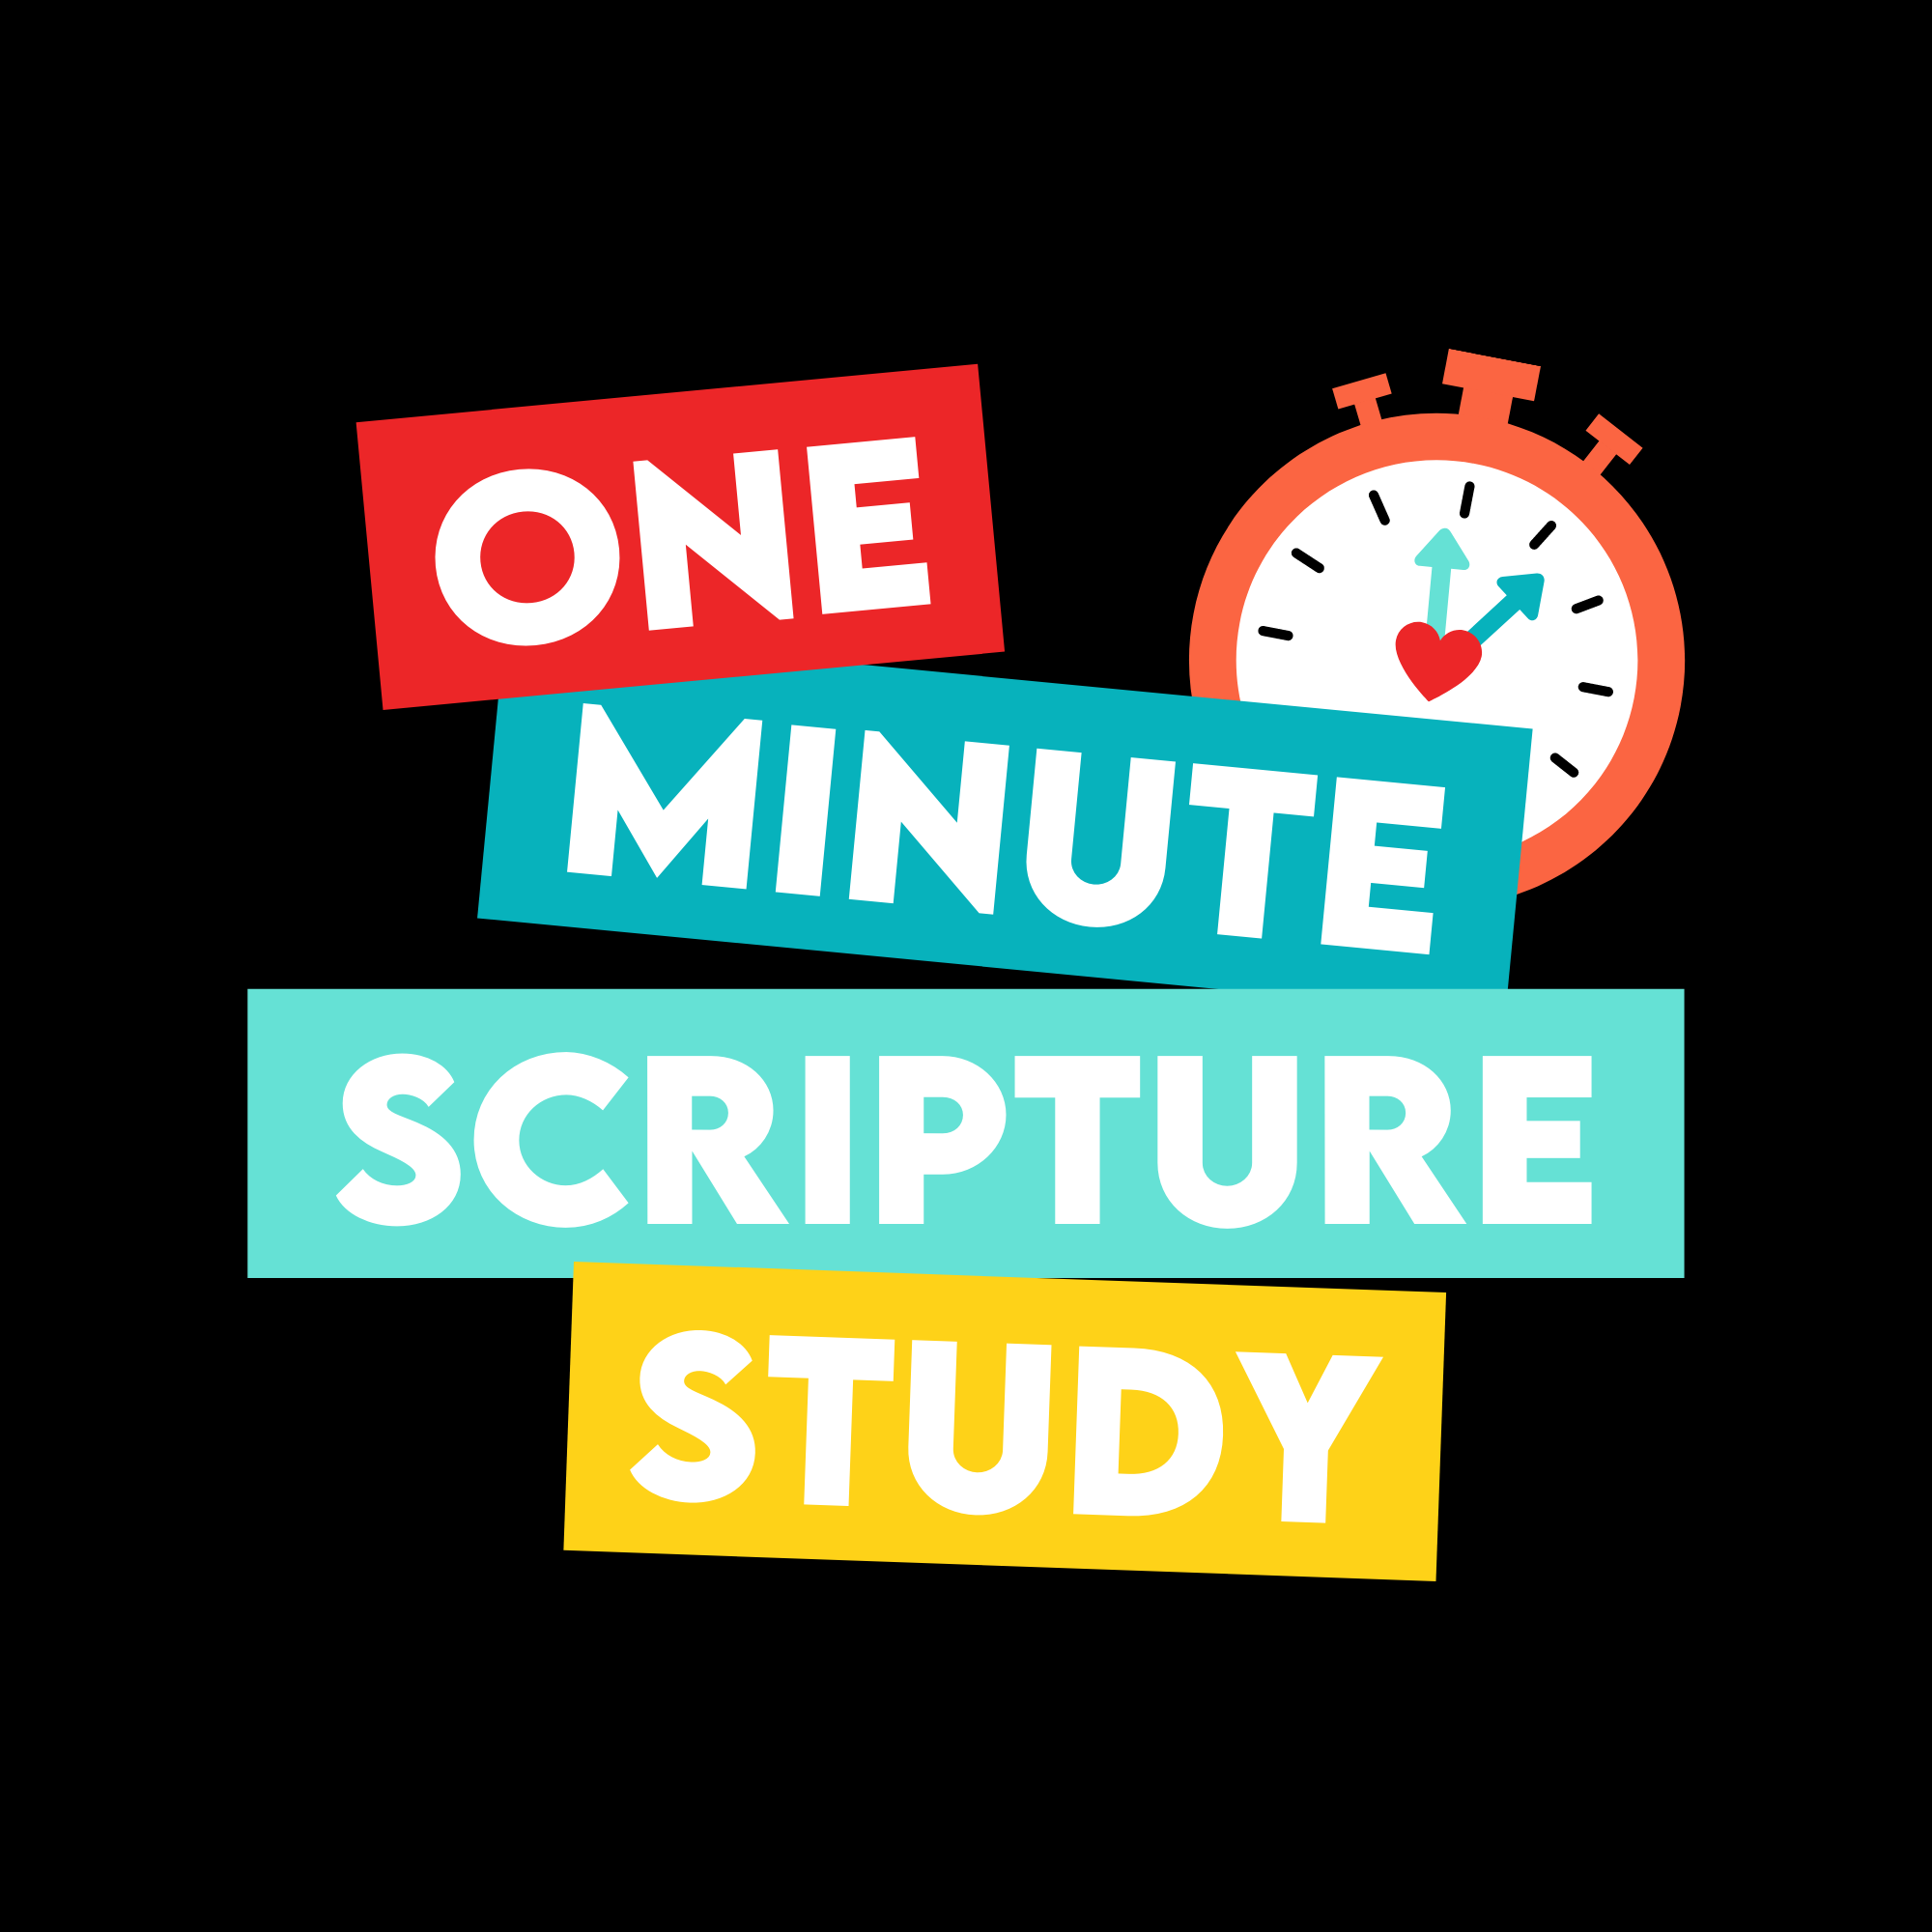 One Minute Scripture Study: A Come Follow Me Podcast show art